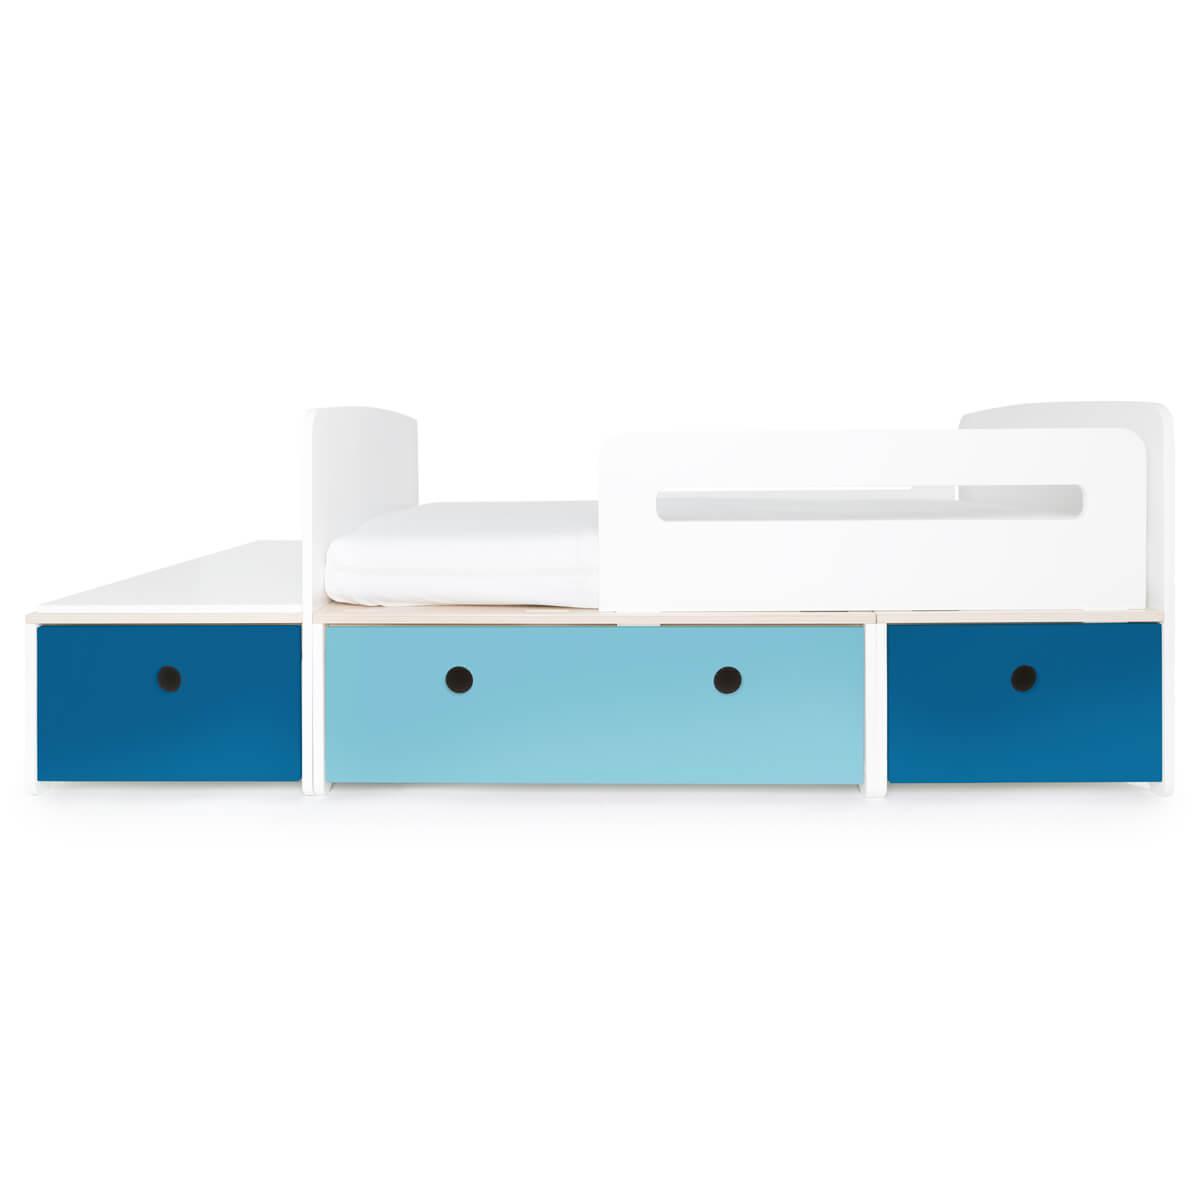 Juniorbett mitwachsend 90x150/200cm COLORFLEX deep marine-paradise blue-deep marine